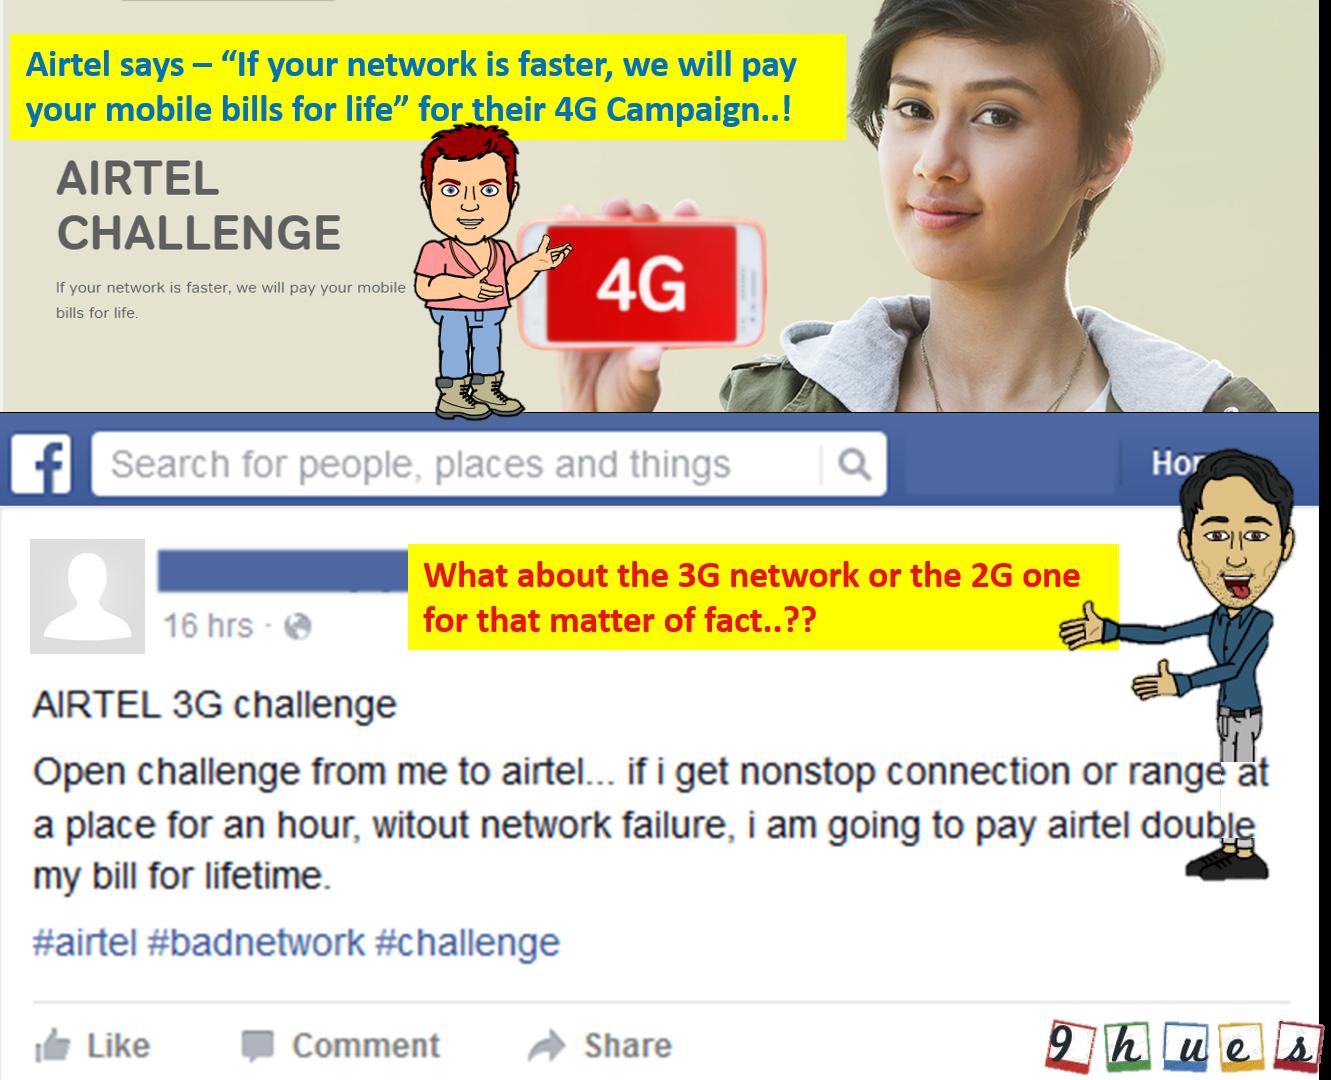 Wiki-How : Airtel 4G Internet Challenge Trolled Video